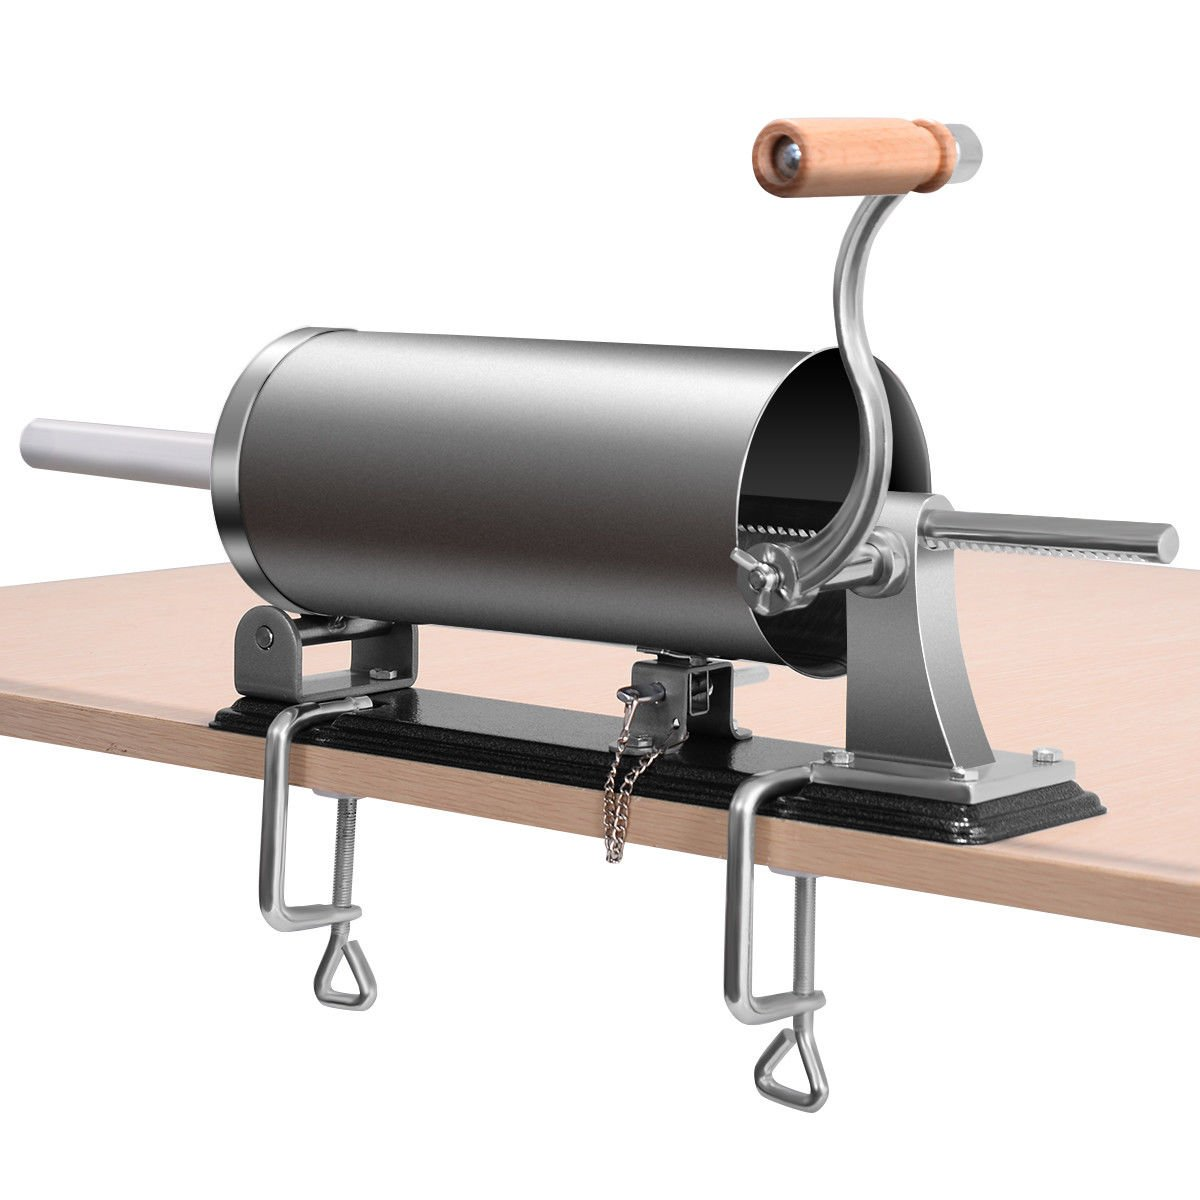 Goplus Horizontal Stainless Steel Sausage Stuffer Maker Meat Filler Kit Commercial (3L) Superbuy